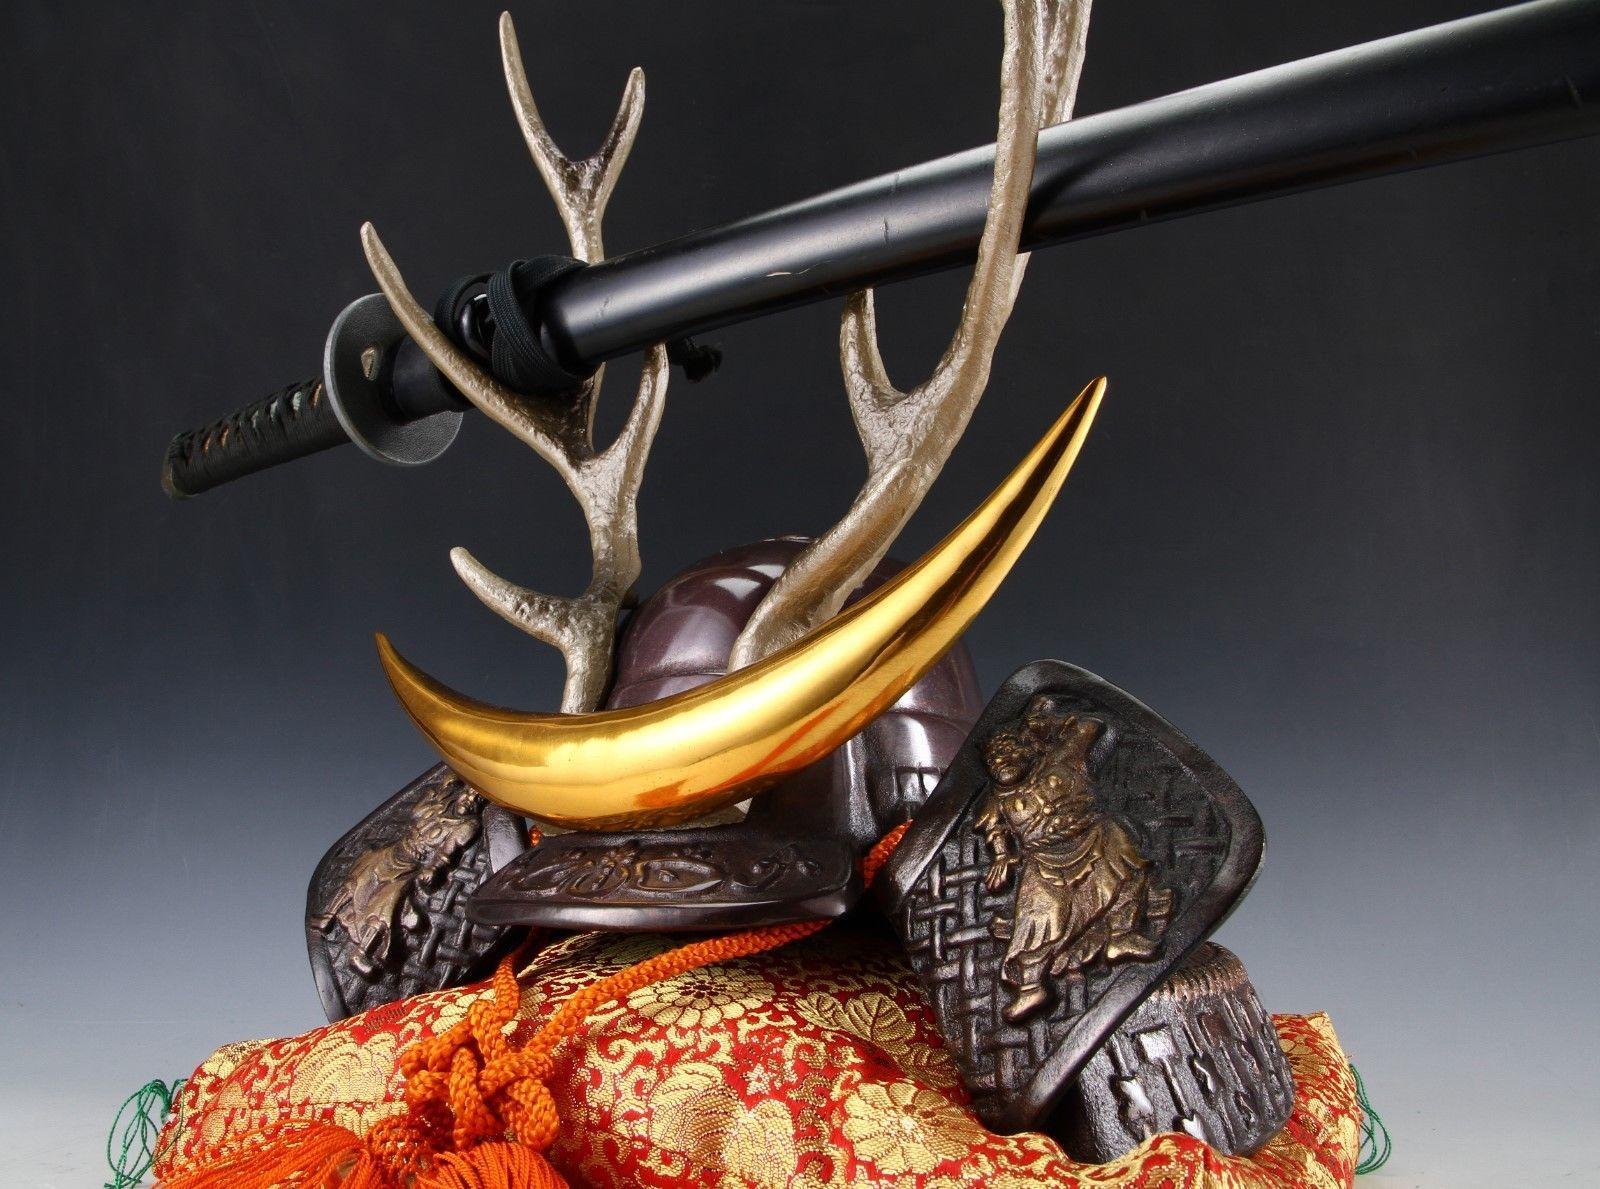 Japanese Beautiful Samurai Helmet -shikanosuke kabuto- with a Replica Blade image 6